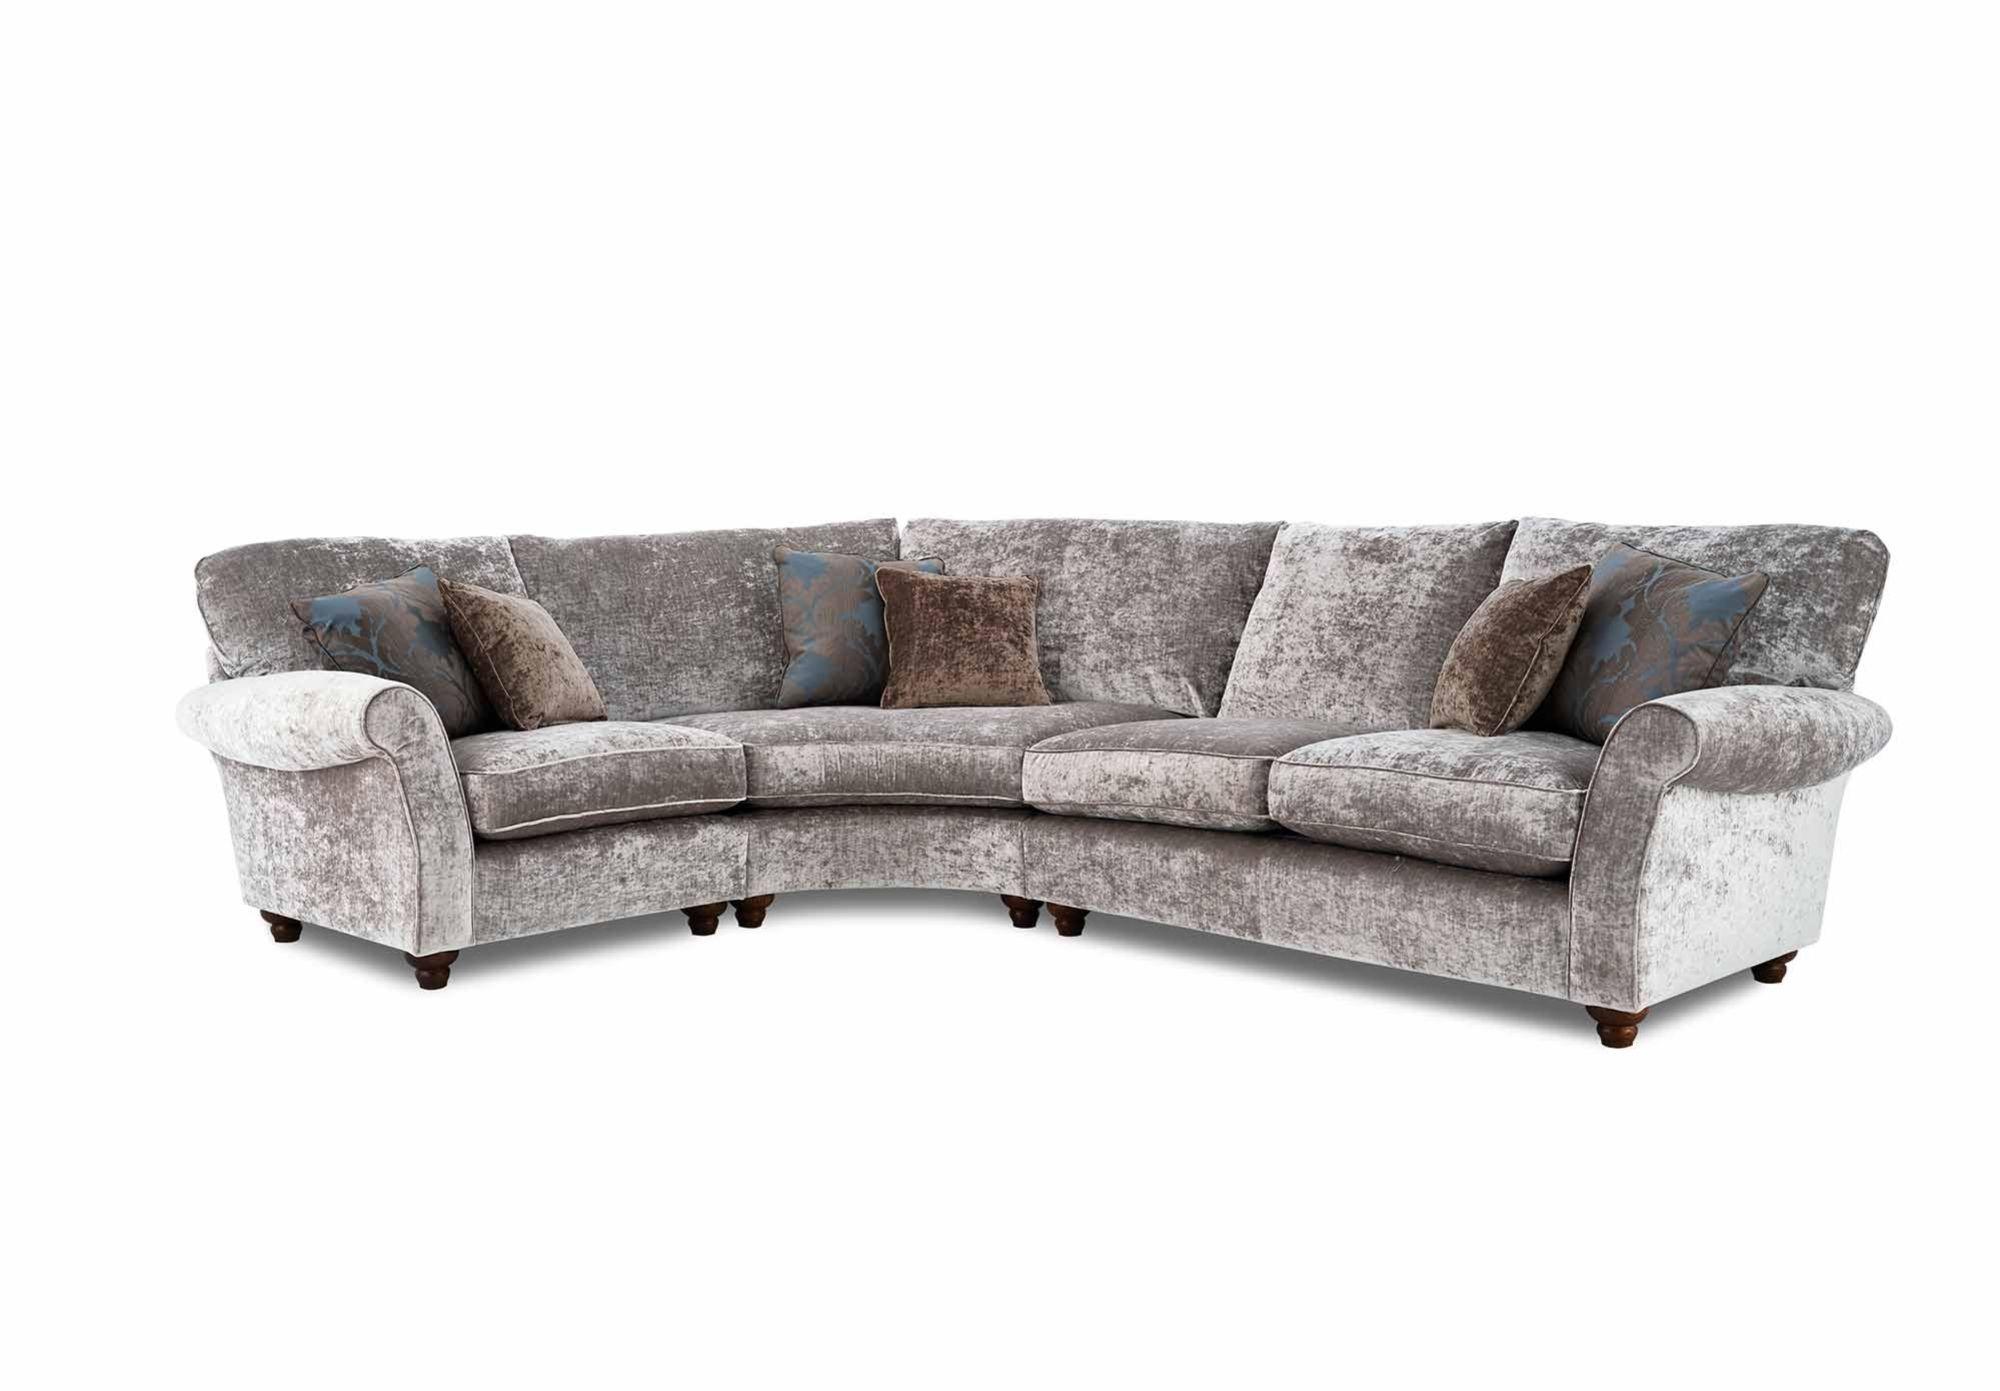 fable corner sofa furniture village macy s orange sectional lhf classic back monroe gorgeous living